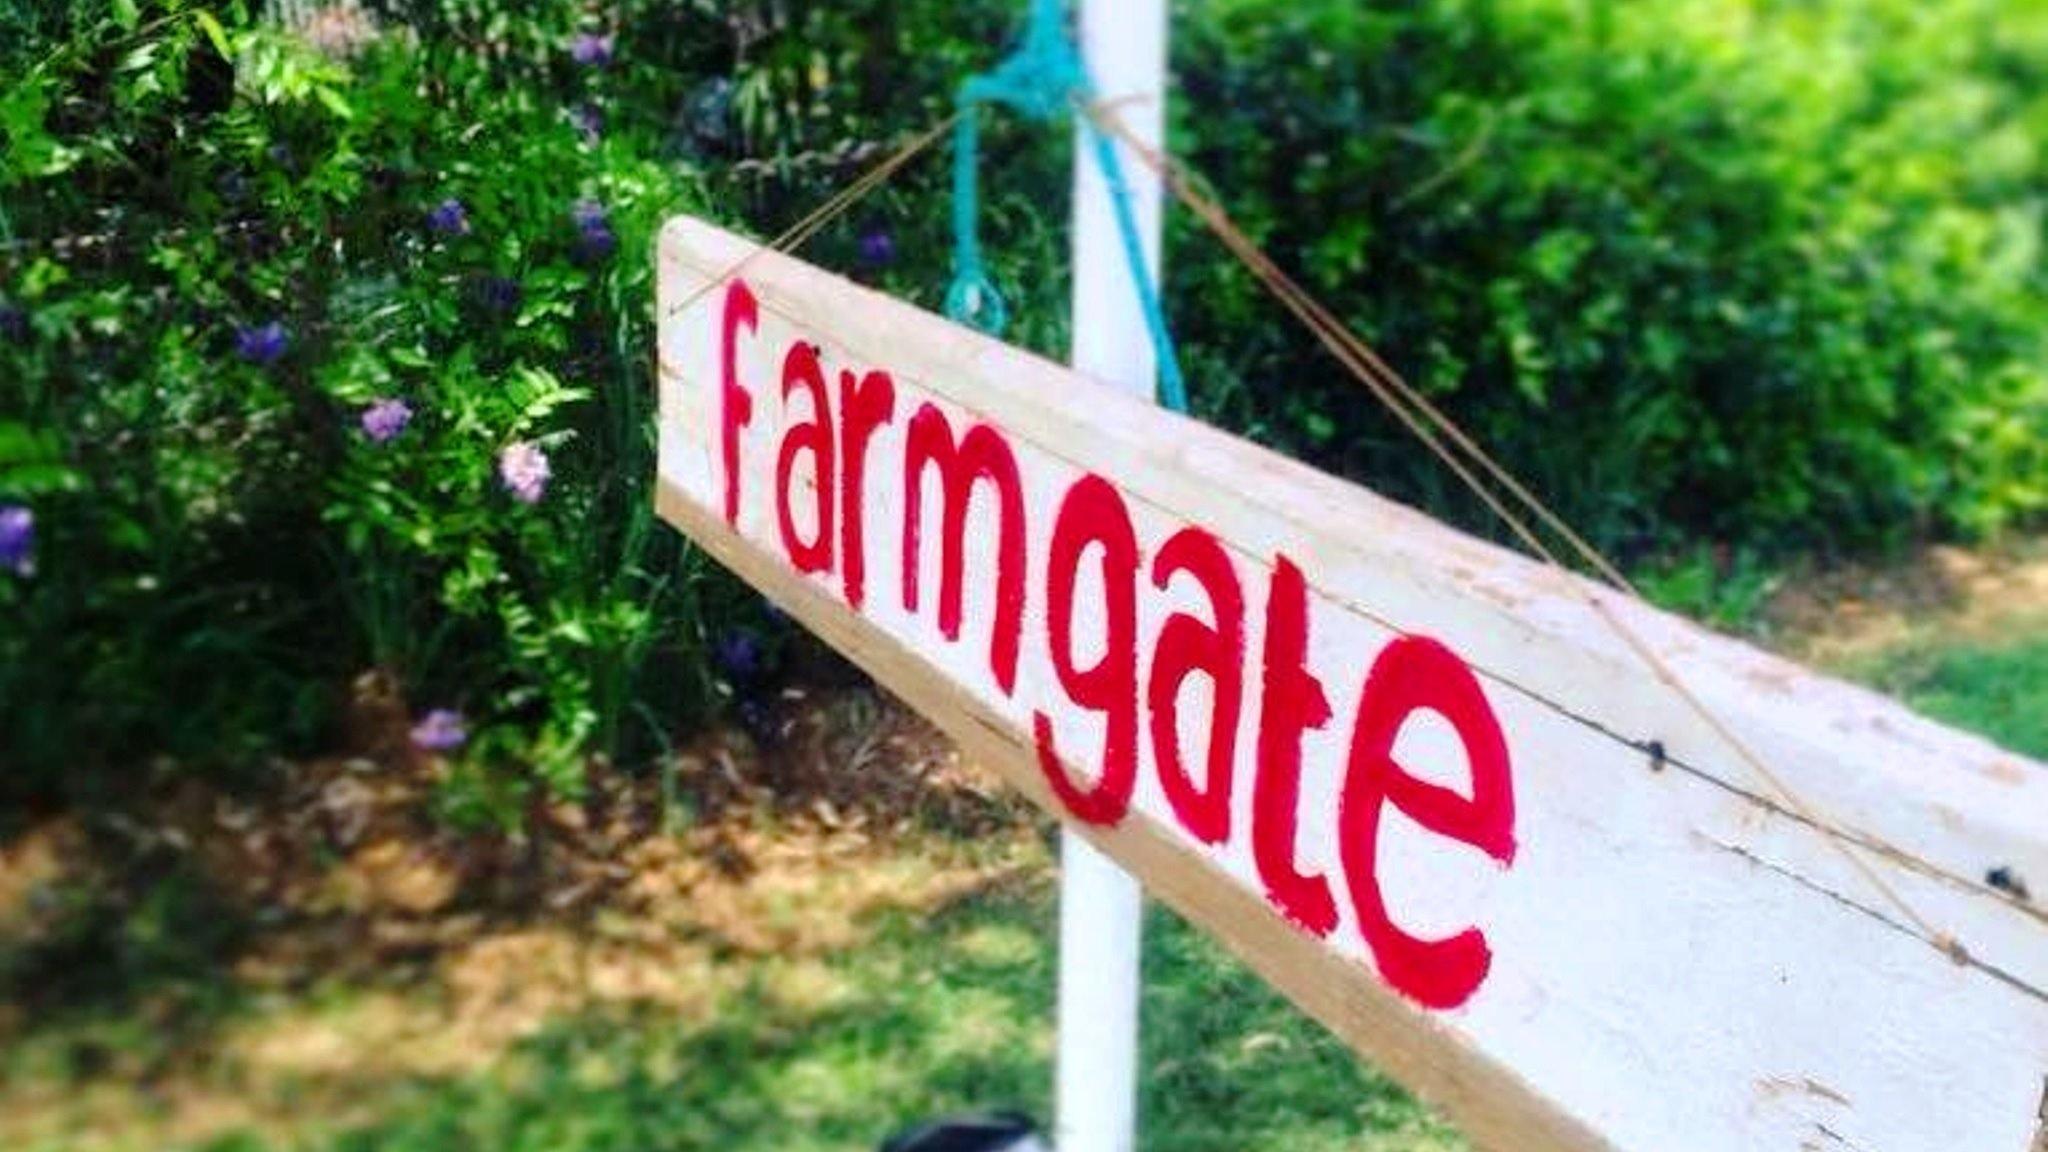 Fairweather Swing sign